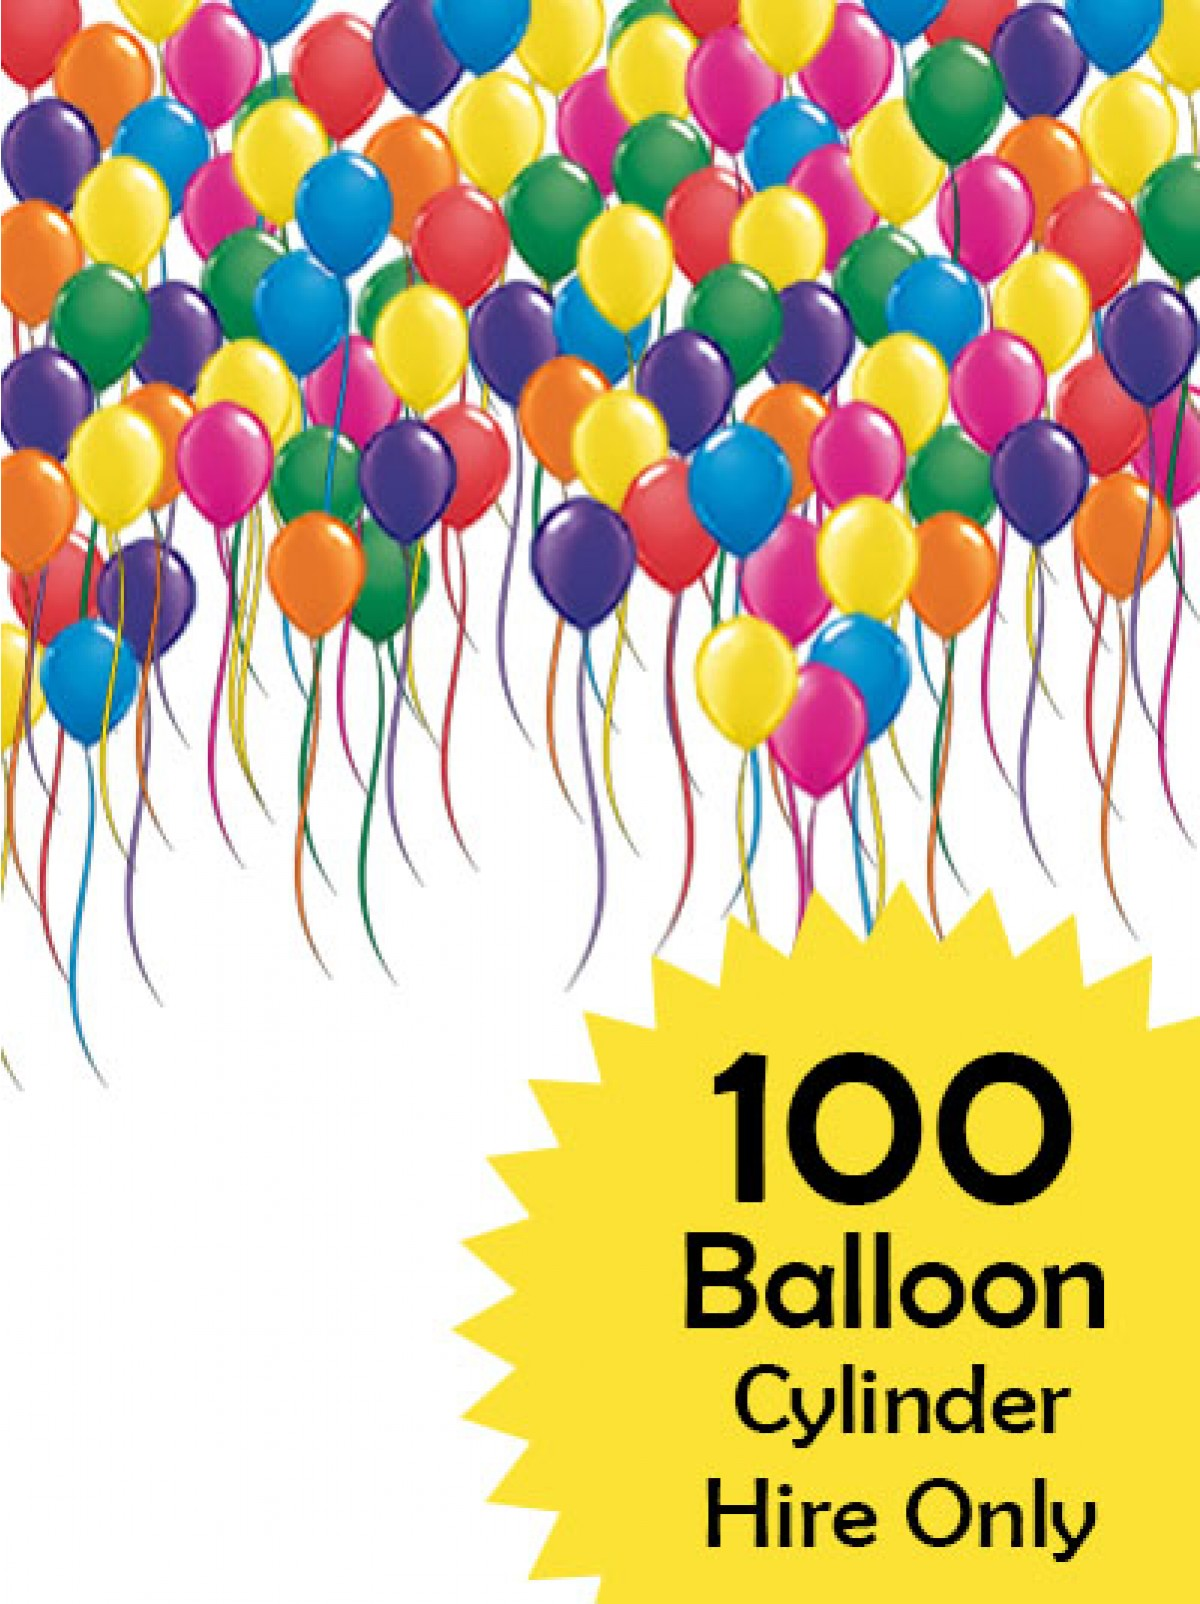 100 clipart balloon, Picture #126955 100 clipart balloon.